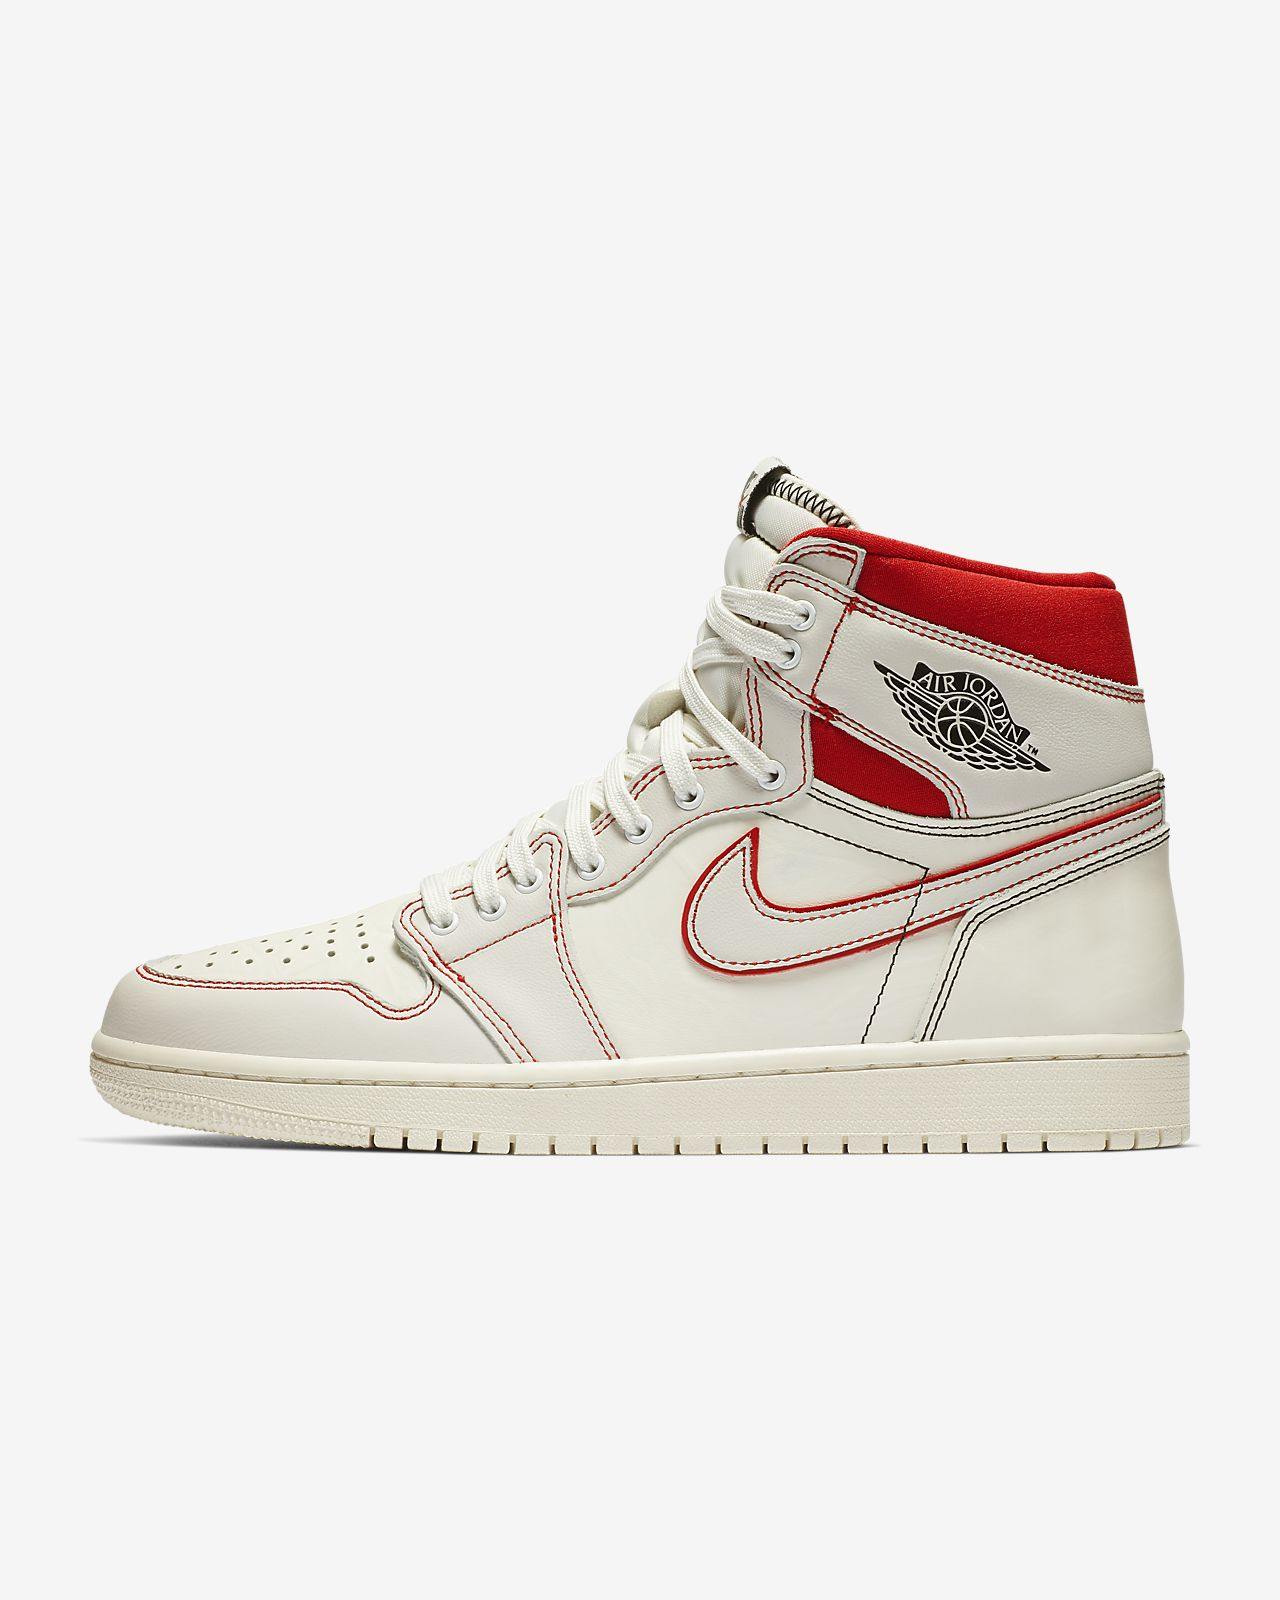 new styles a2274 d24bf ... Air Jordan 1 Retro High OG Shoe